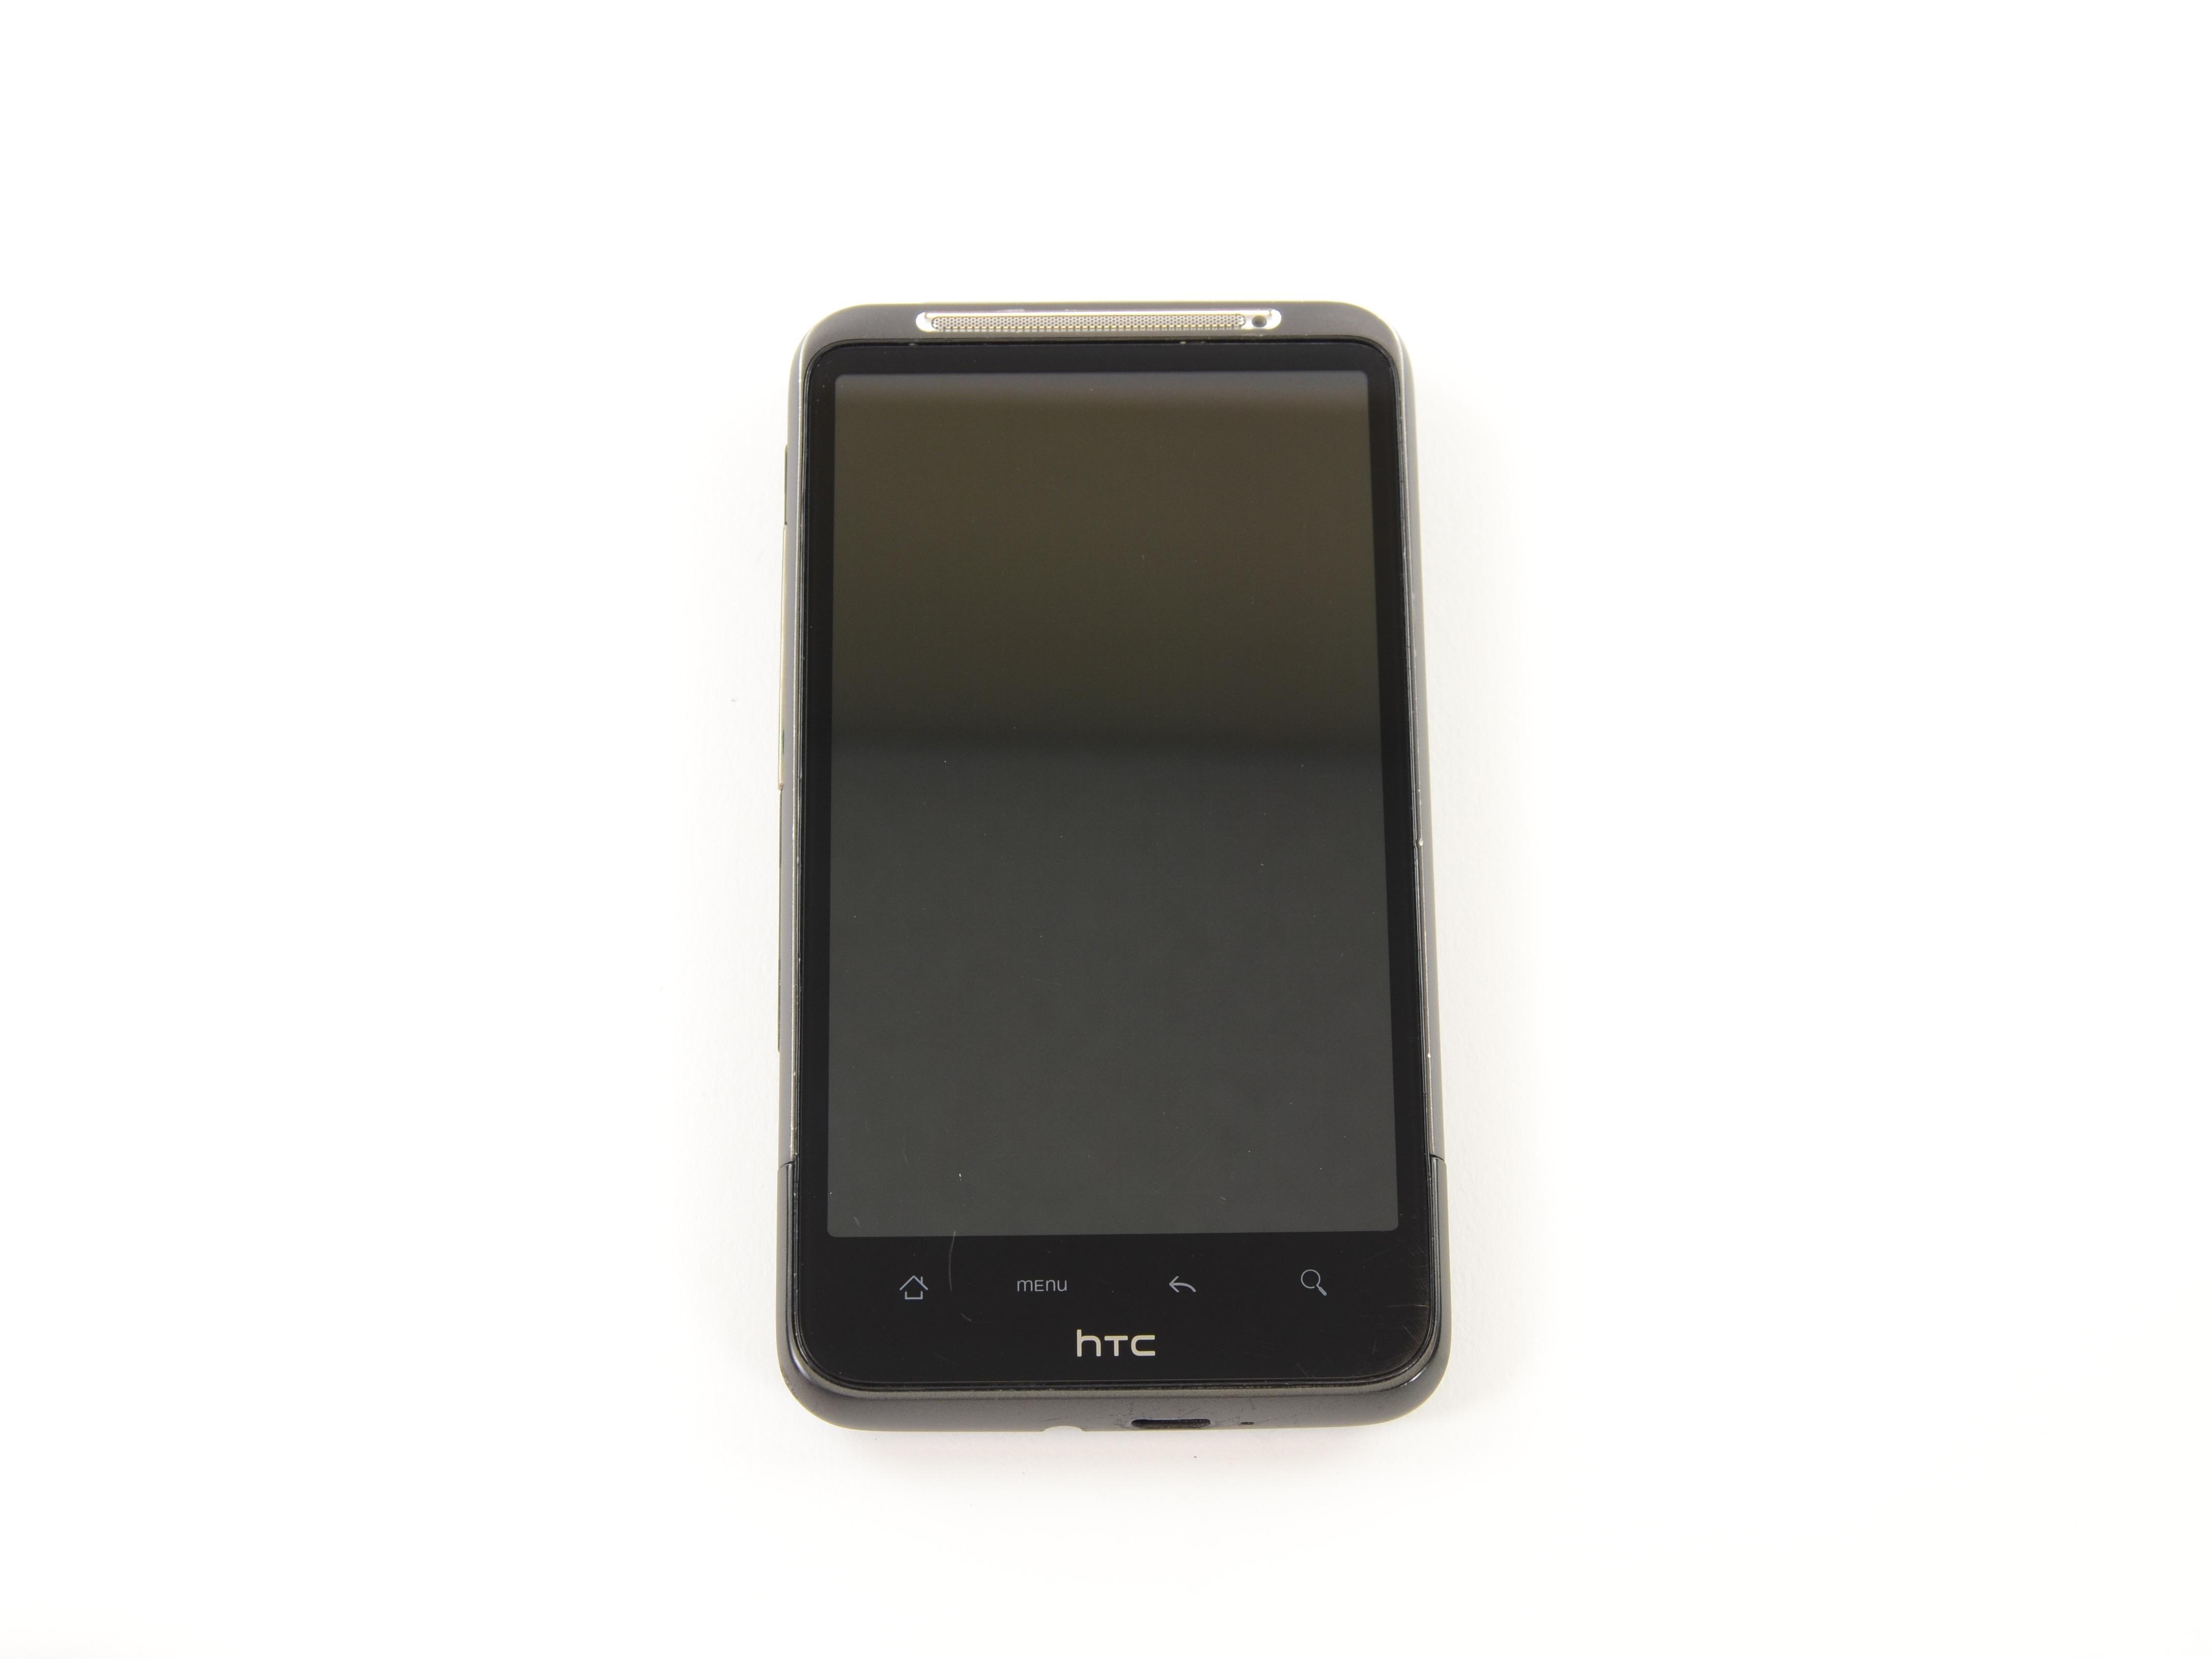 htc inspire 4g repair ifixit rh ifixit com HTC Inspire Case HTC Inspire Specs